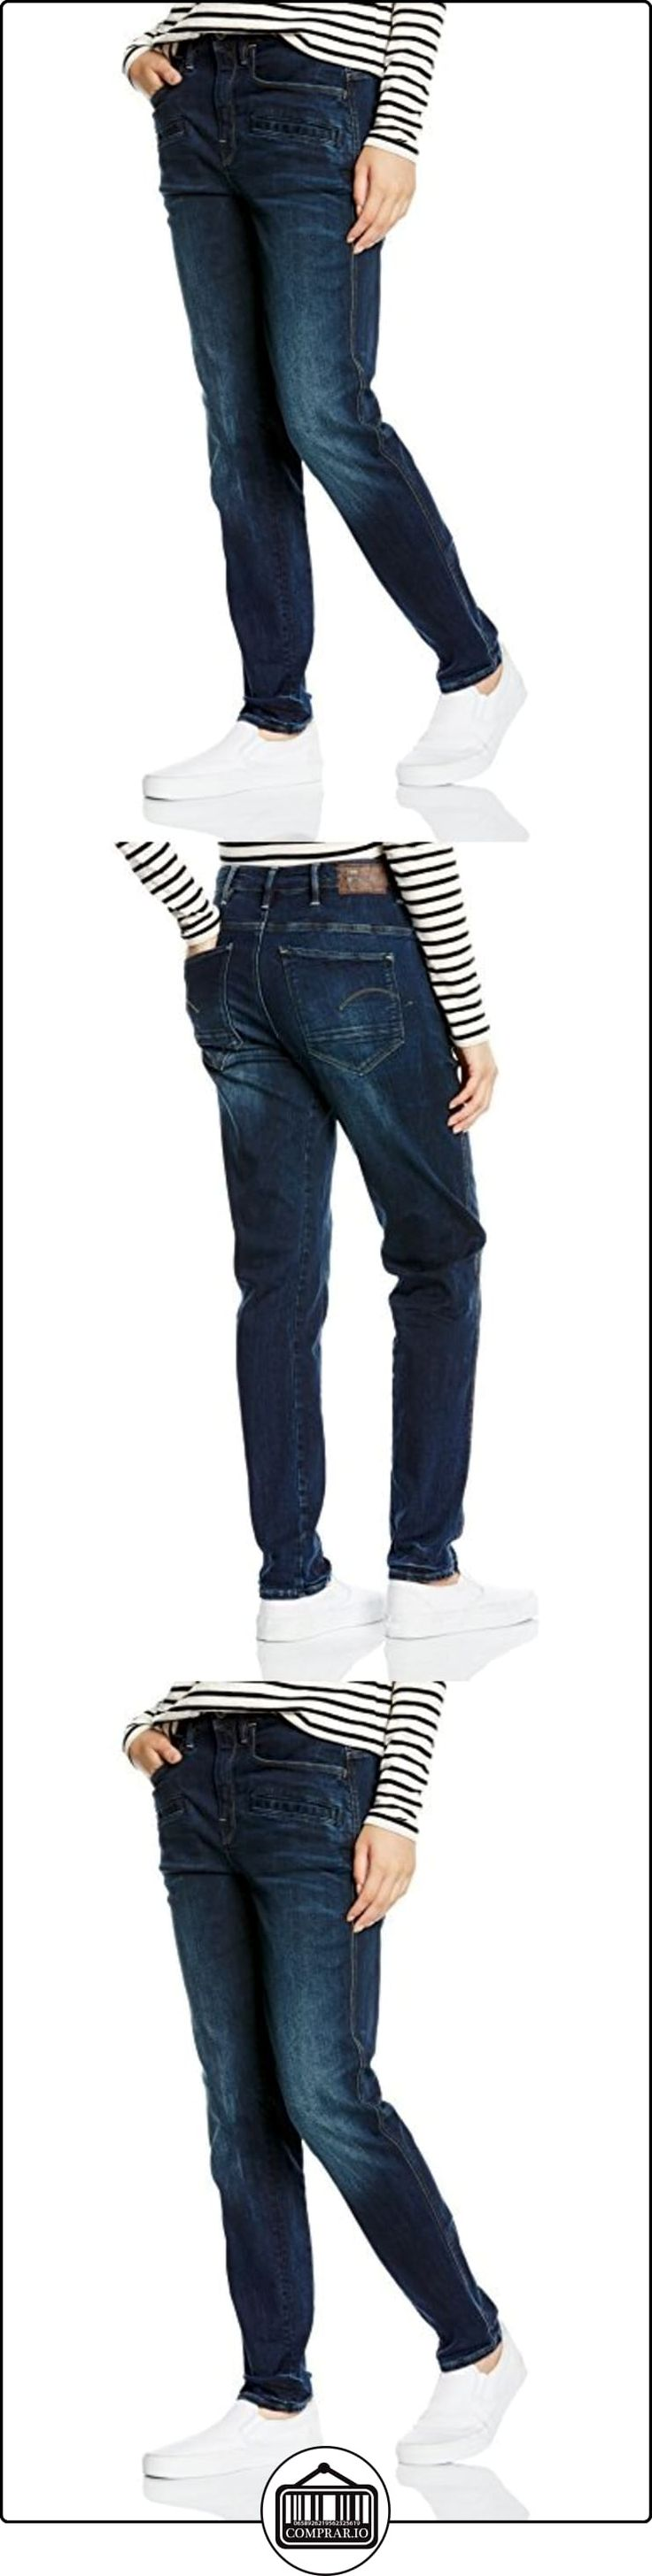 G-STAR Davin 3D High Boyfriend - Neutro stretch denim-Pantalones Mujer,, Azul (Dark Aged), W24 / L32 (ES 34)  ✿ Vaqueros ✿